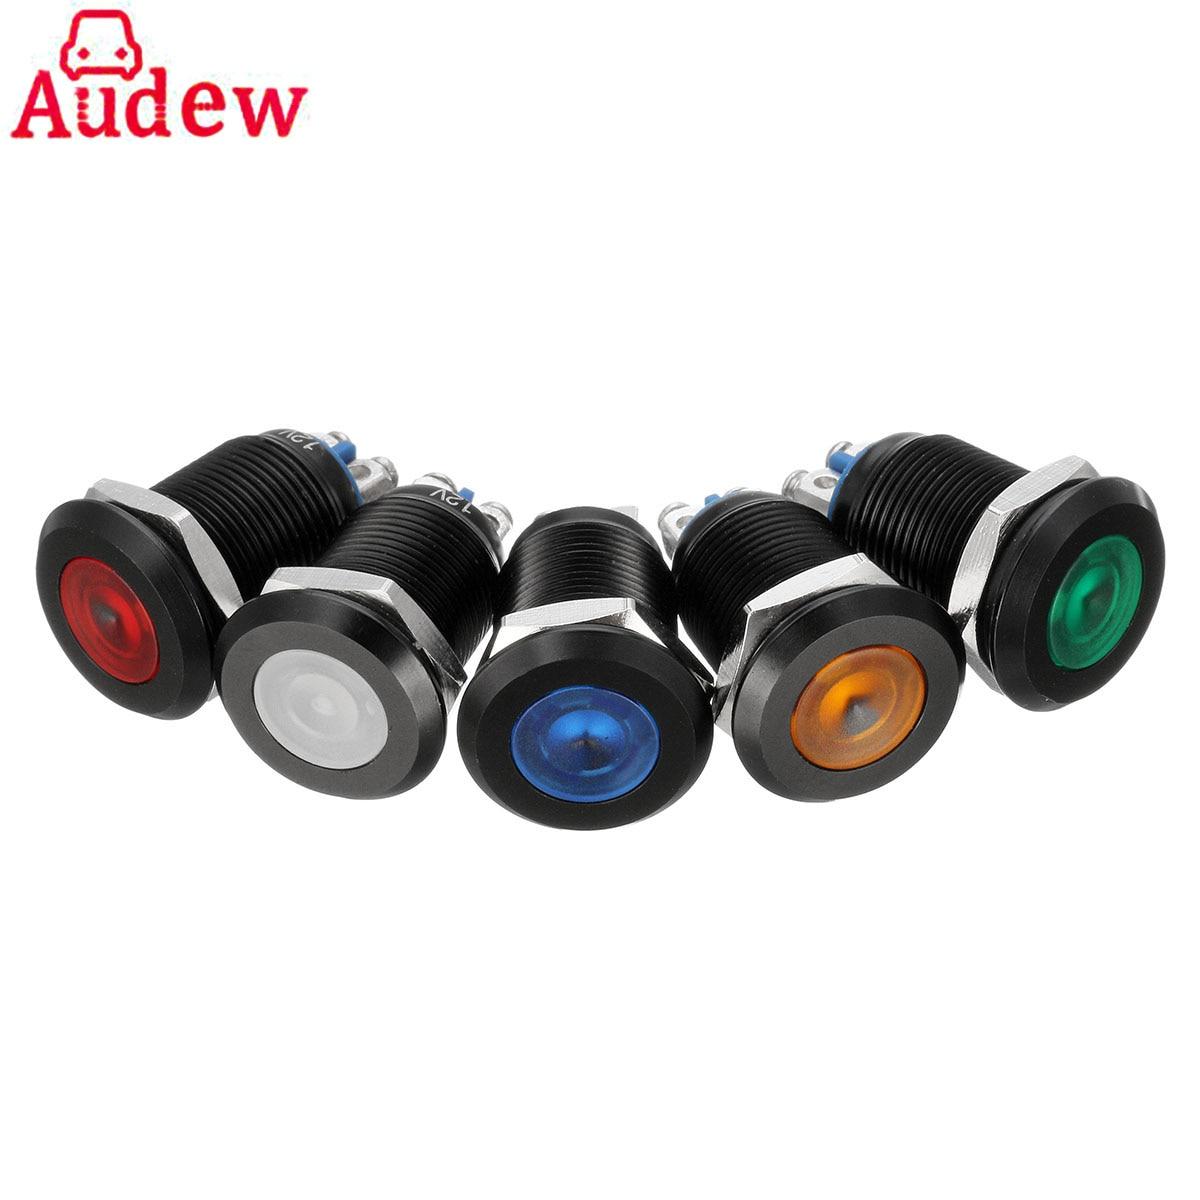 12mm 12V Car LED Metal Indicator Pilot Dash Light Lamp & Screw Terminal Black Casing